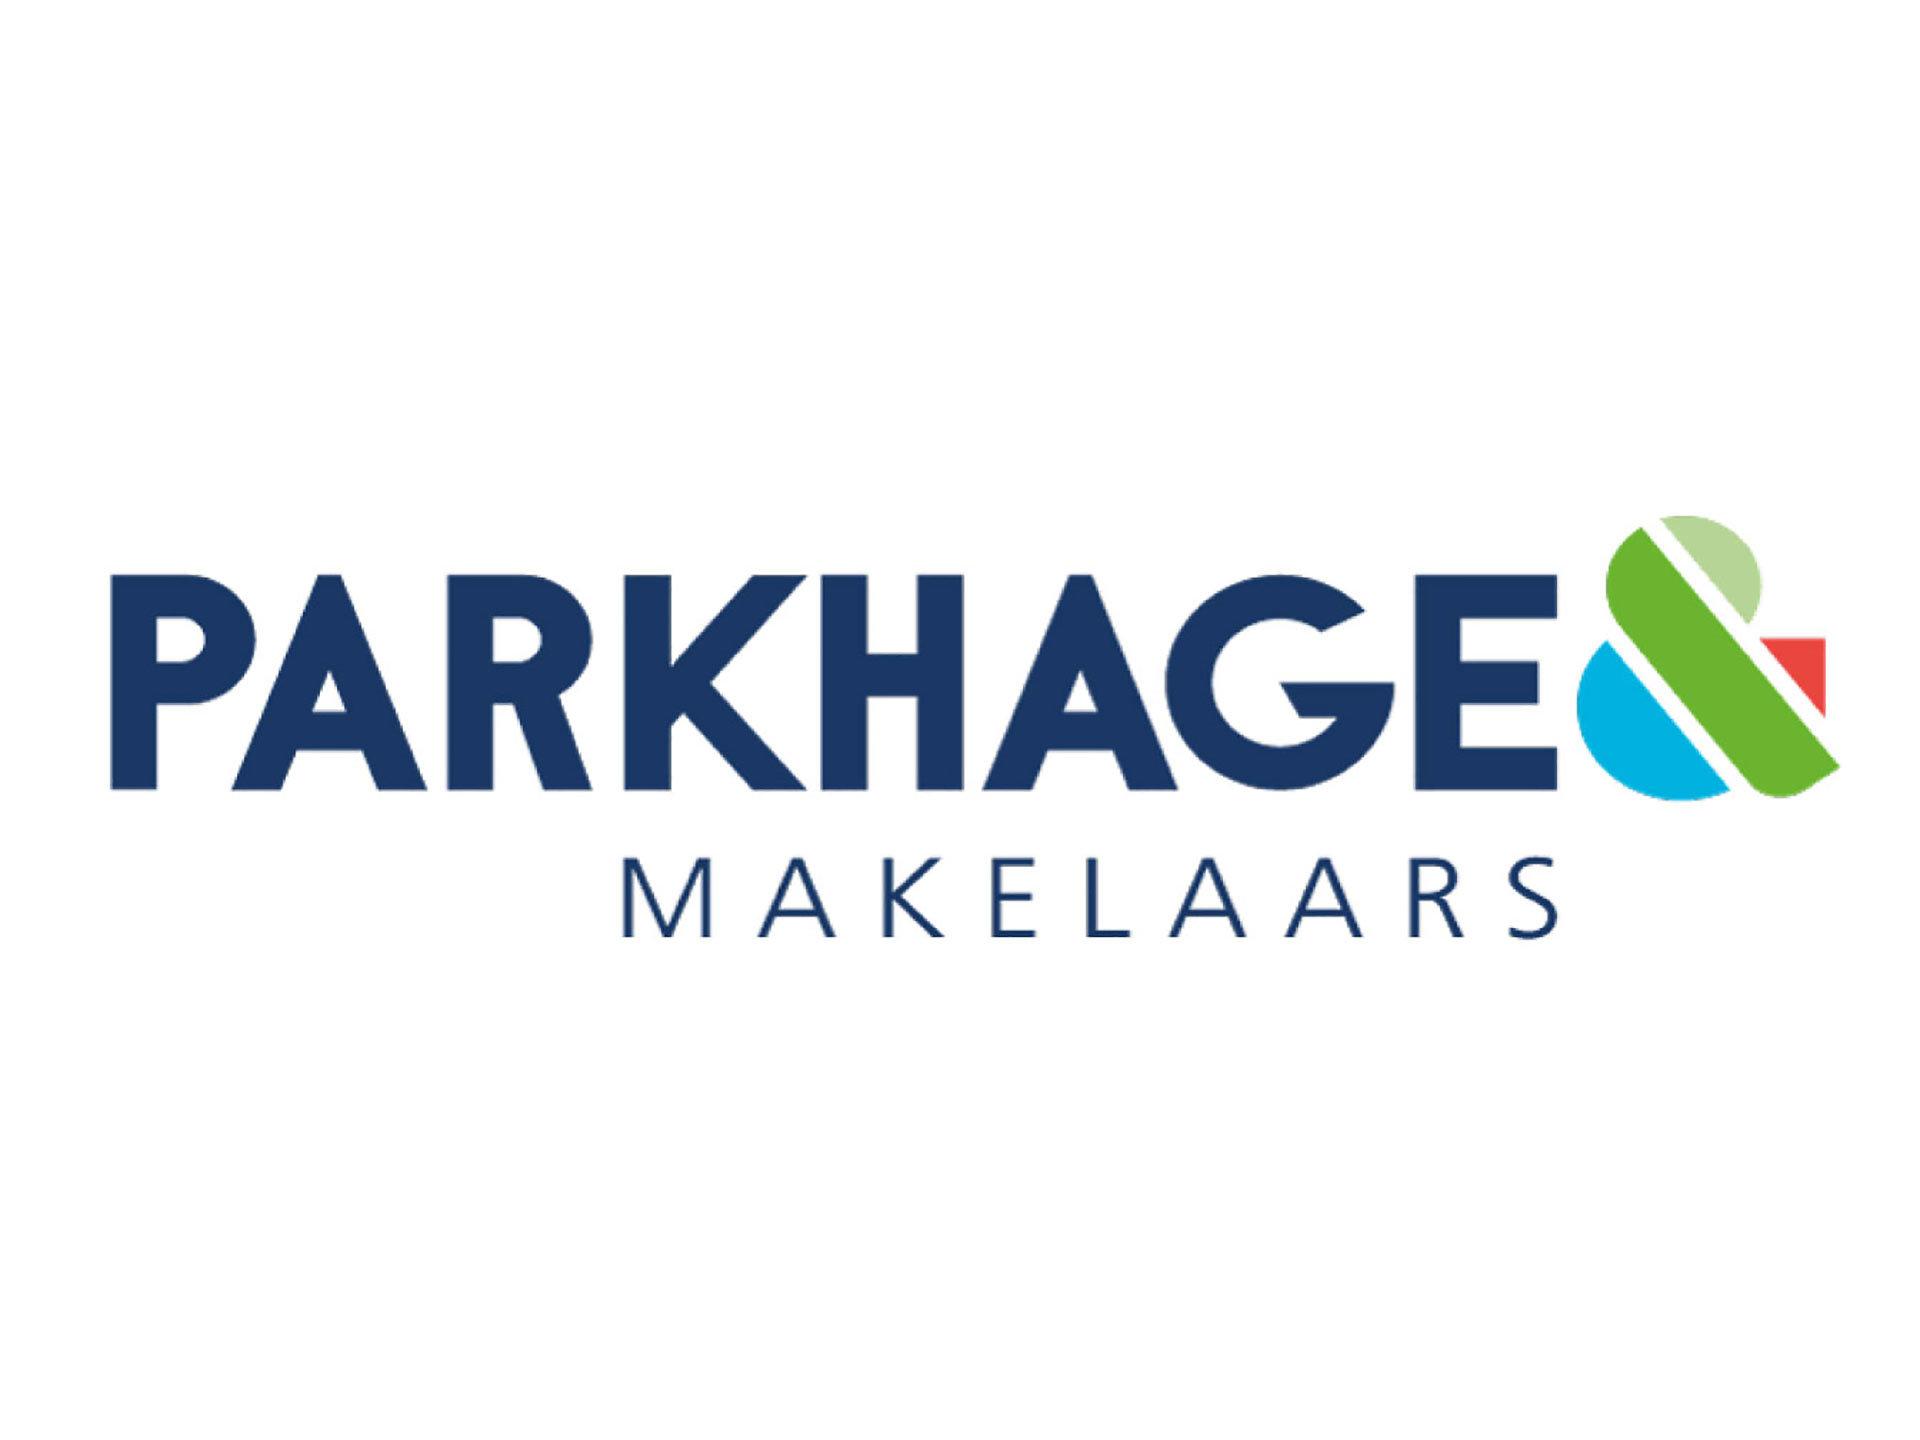 made-marketing-logo-parkhage-2